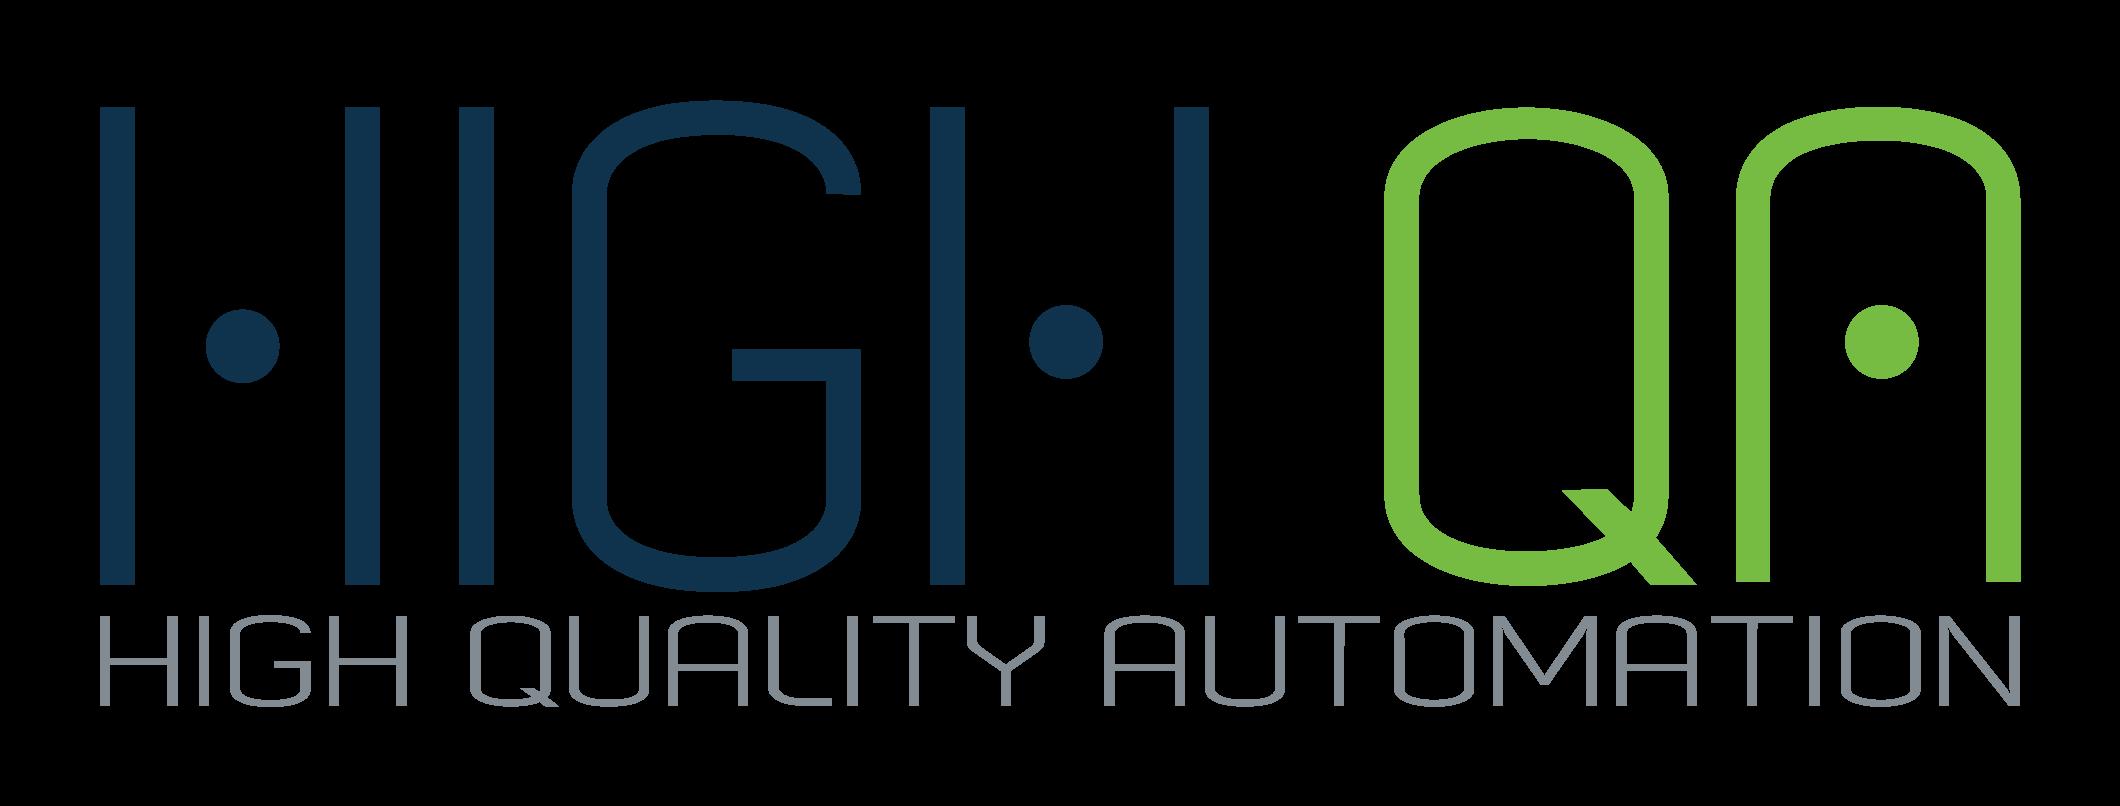 High QA | High Quality Automation logo